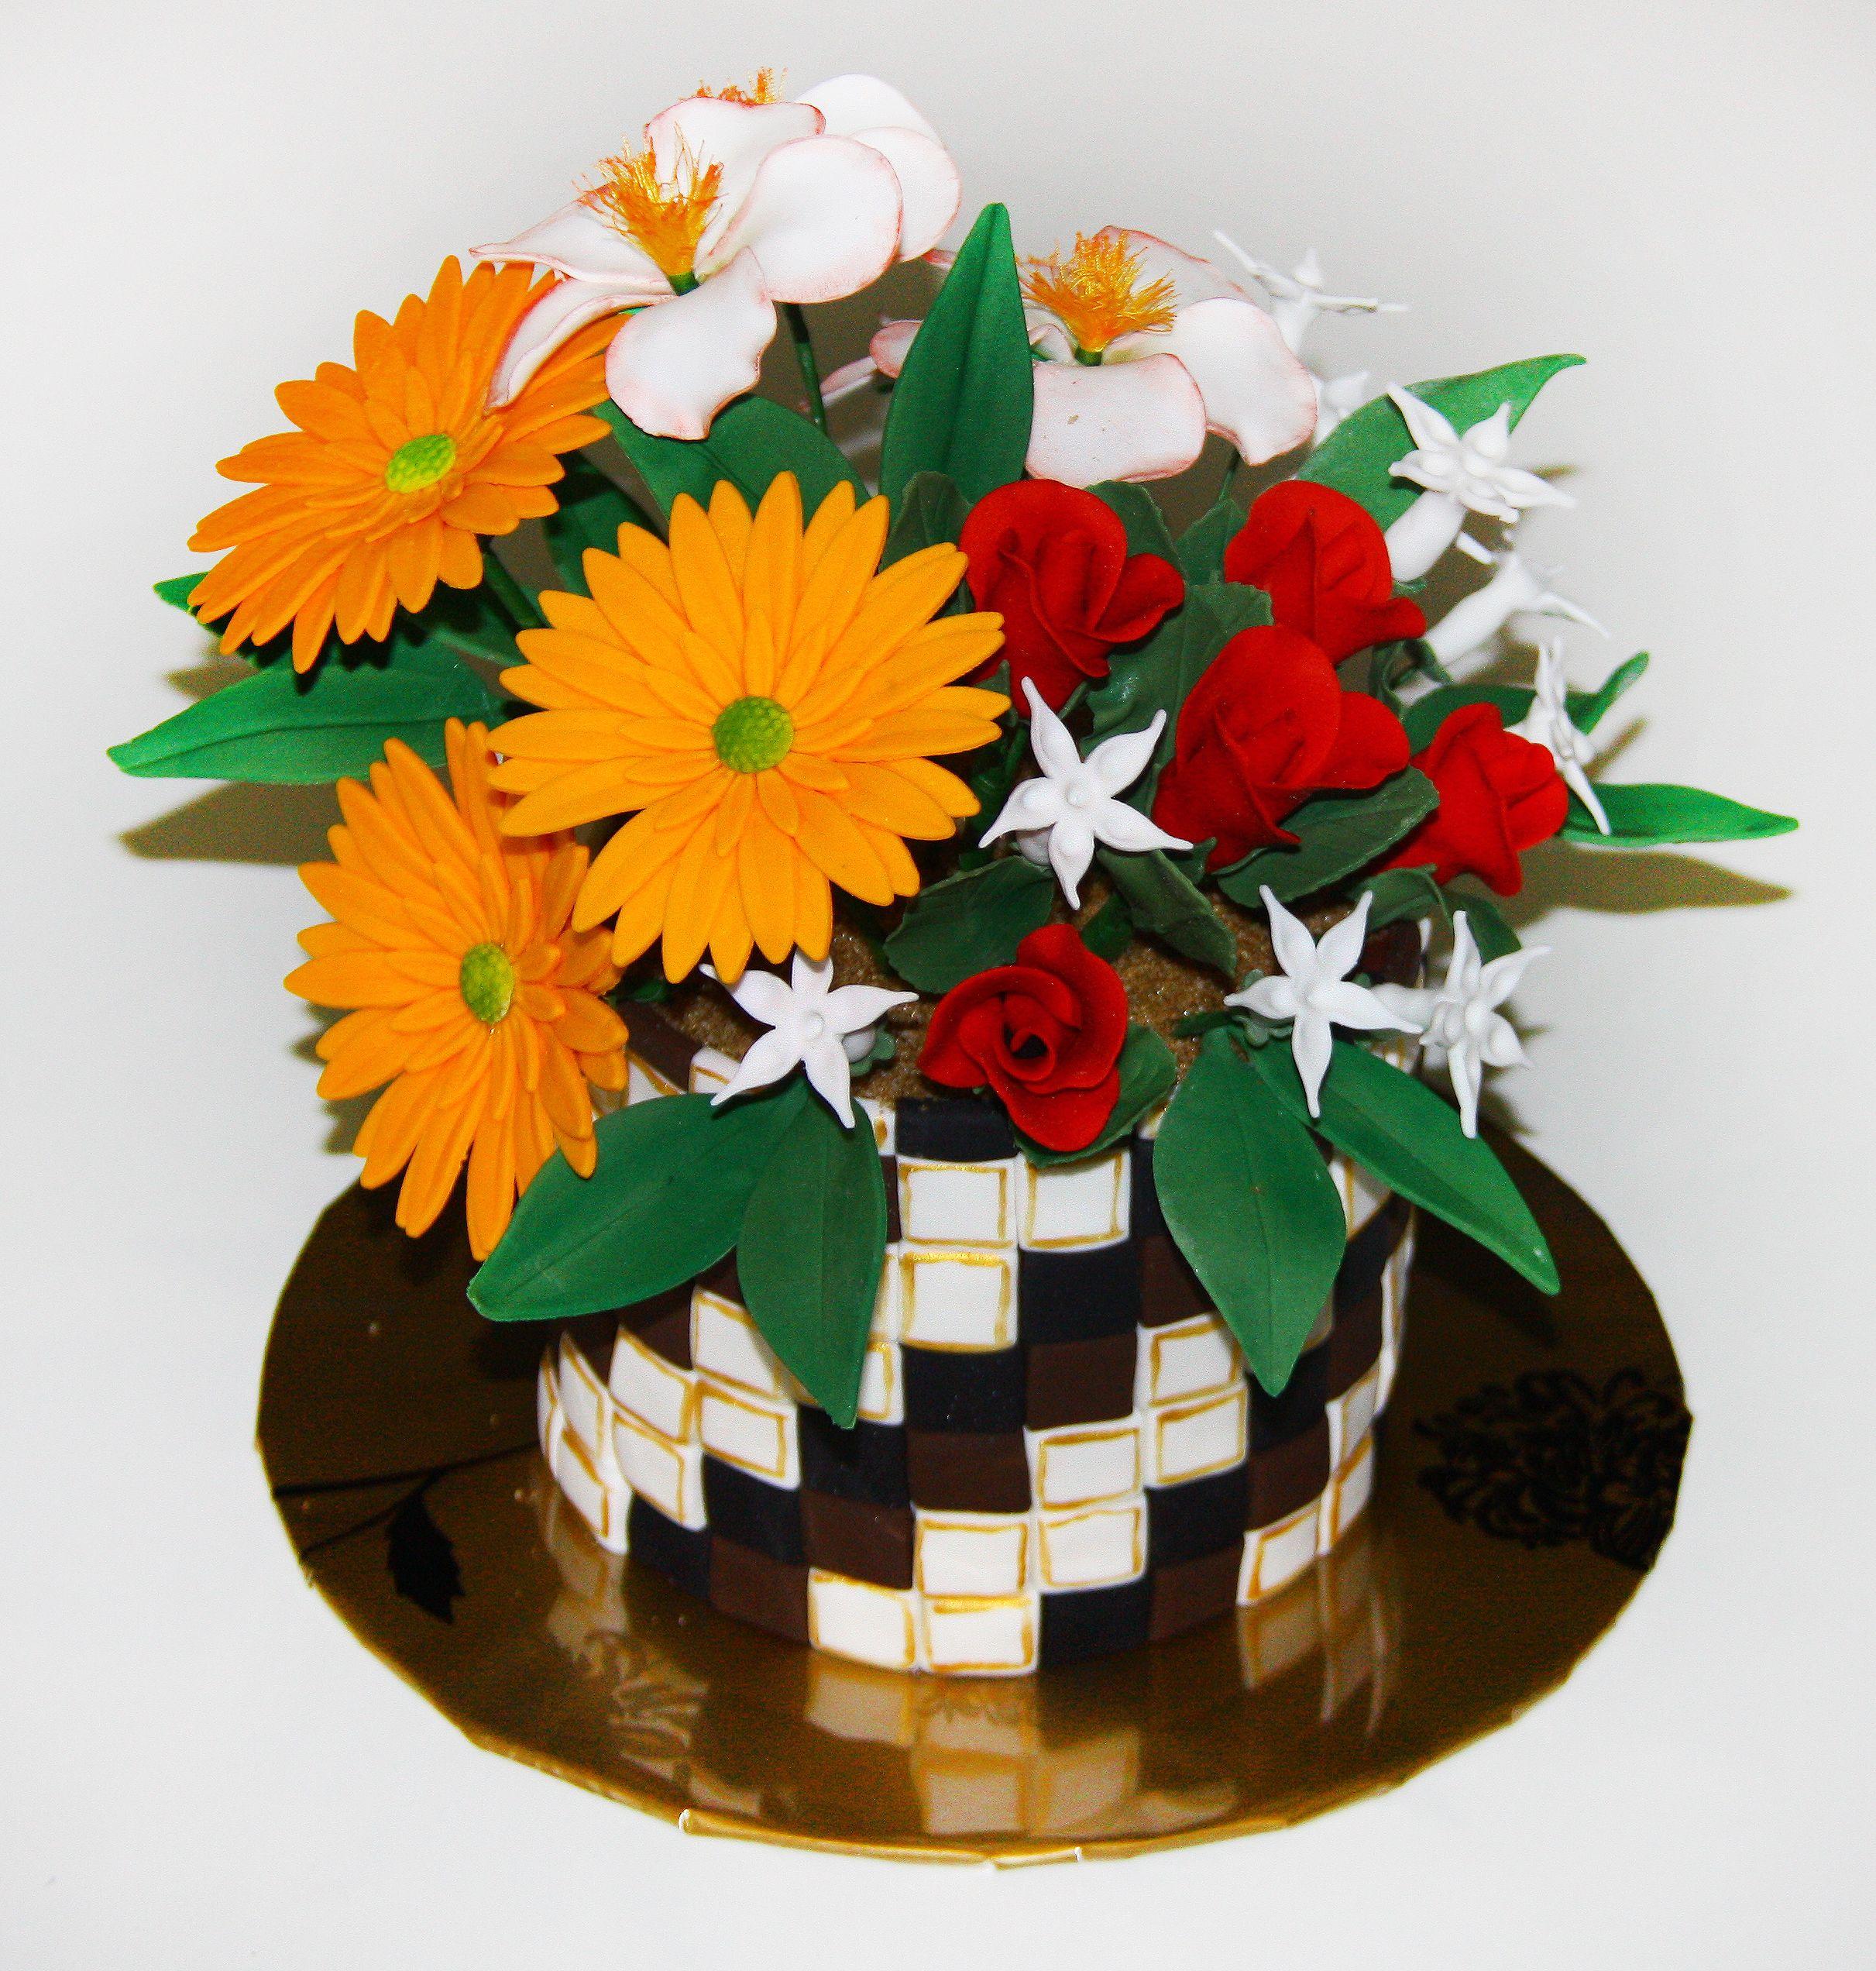 Sweetz sweetz cakes brisbane fondant cakes birthday sweetz sweetz cakes brisbane fondant cakes birthday cakes izmirmasajfo